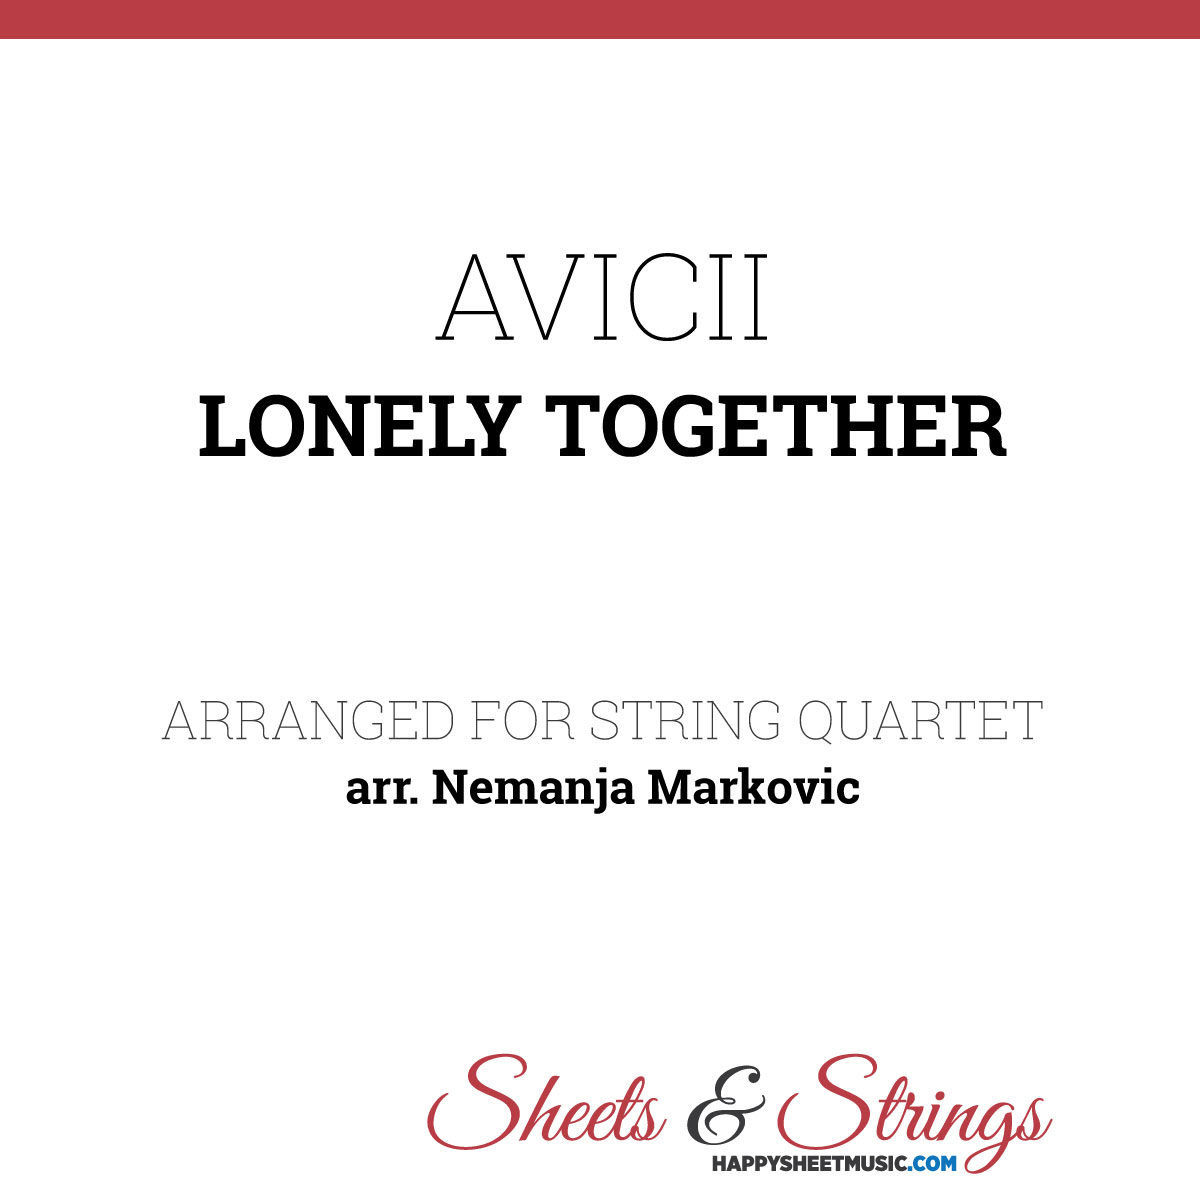 Avicii - Lonely Together - Sheet Music for String Quartet